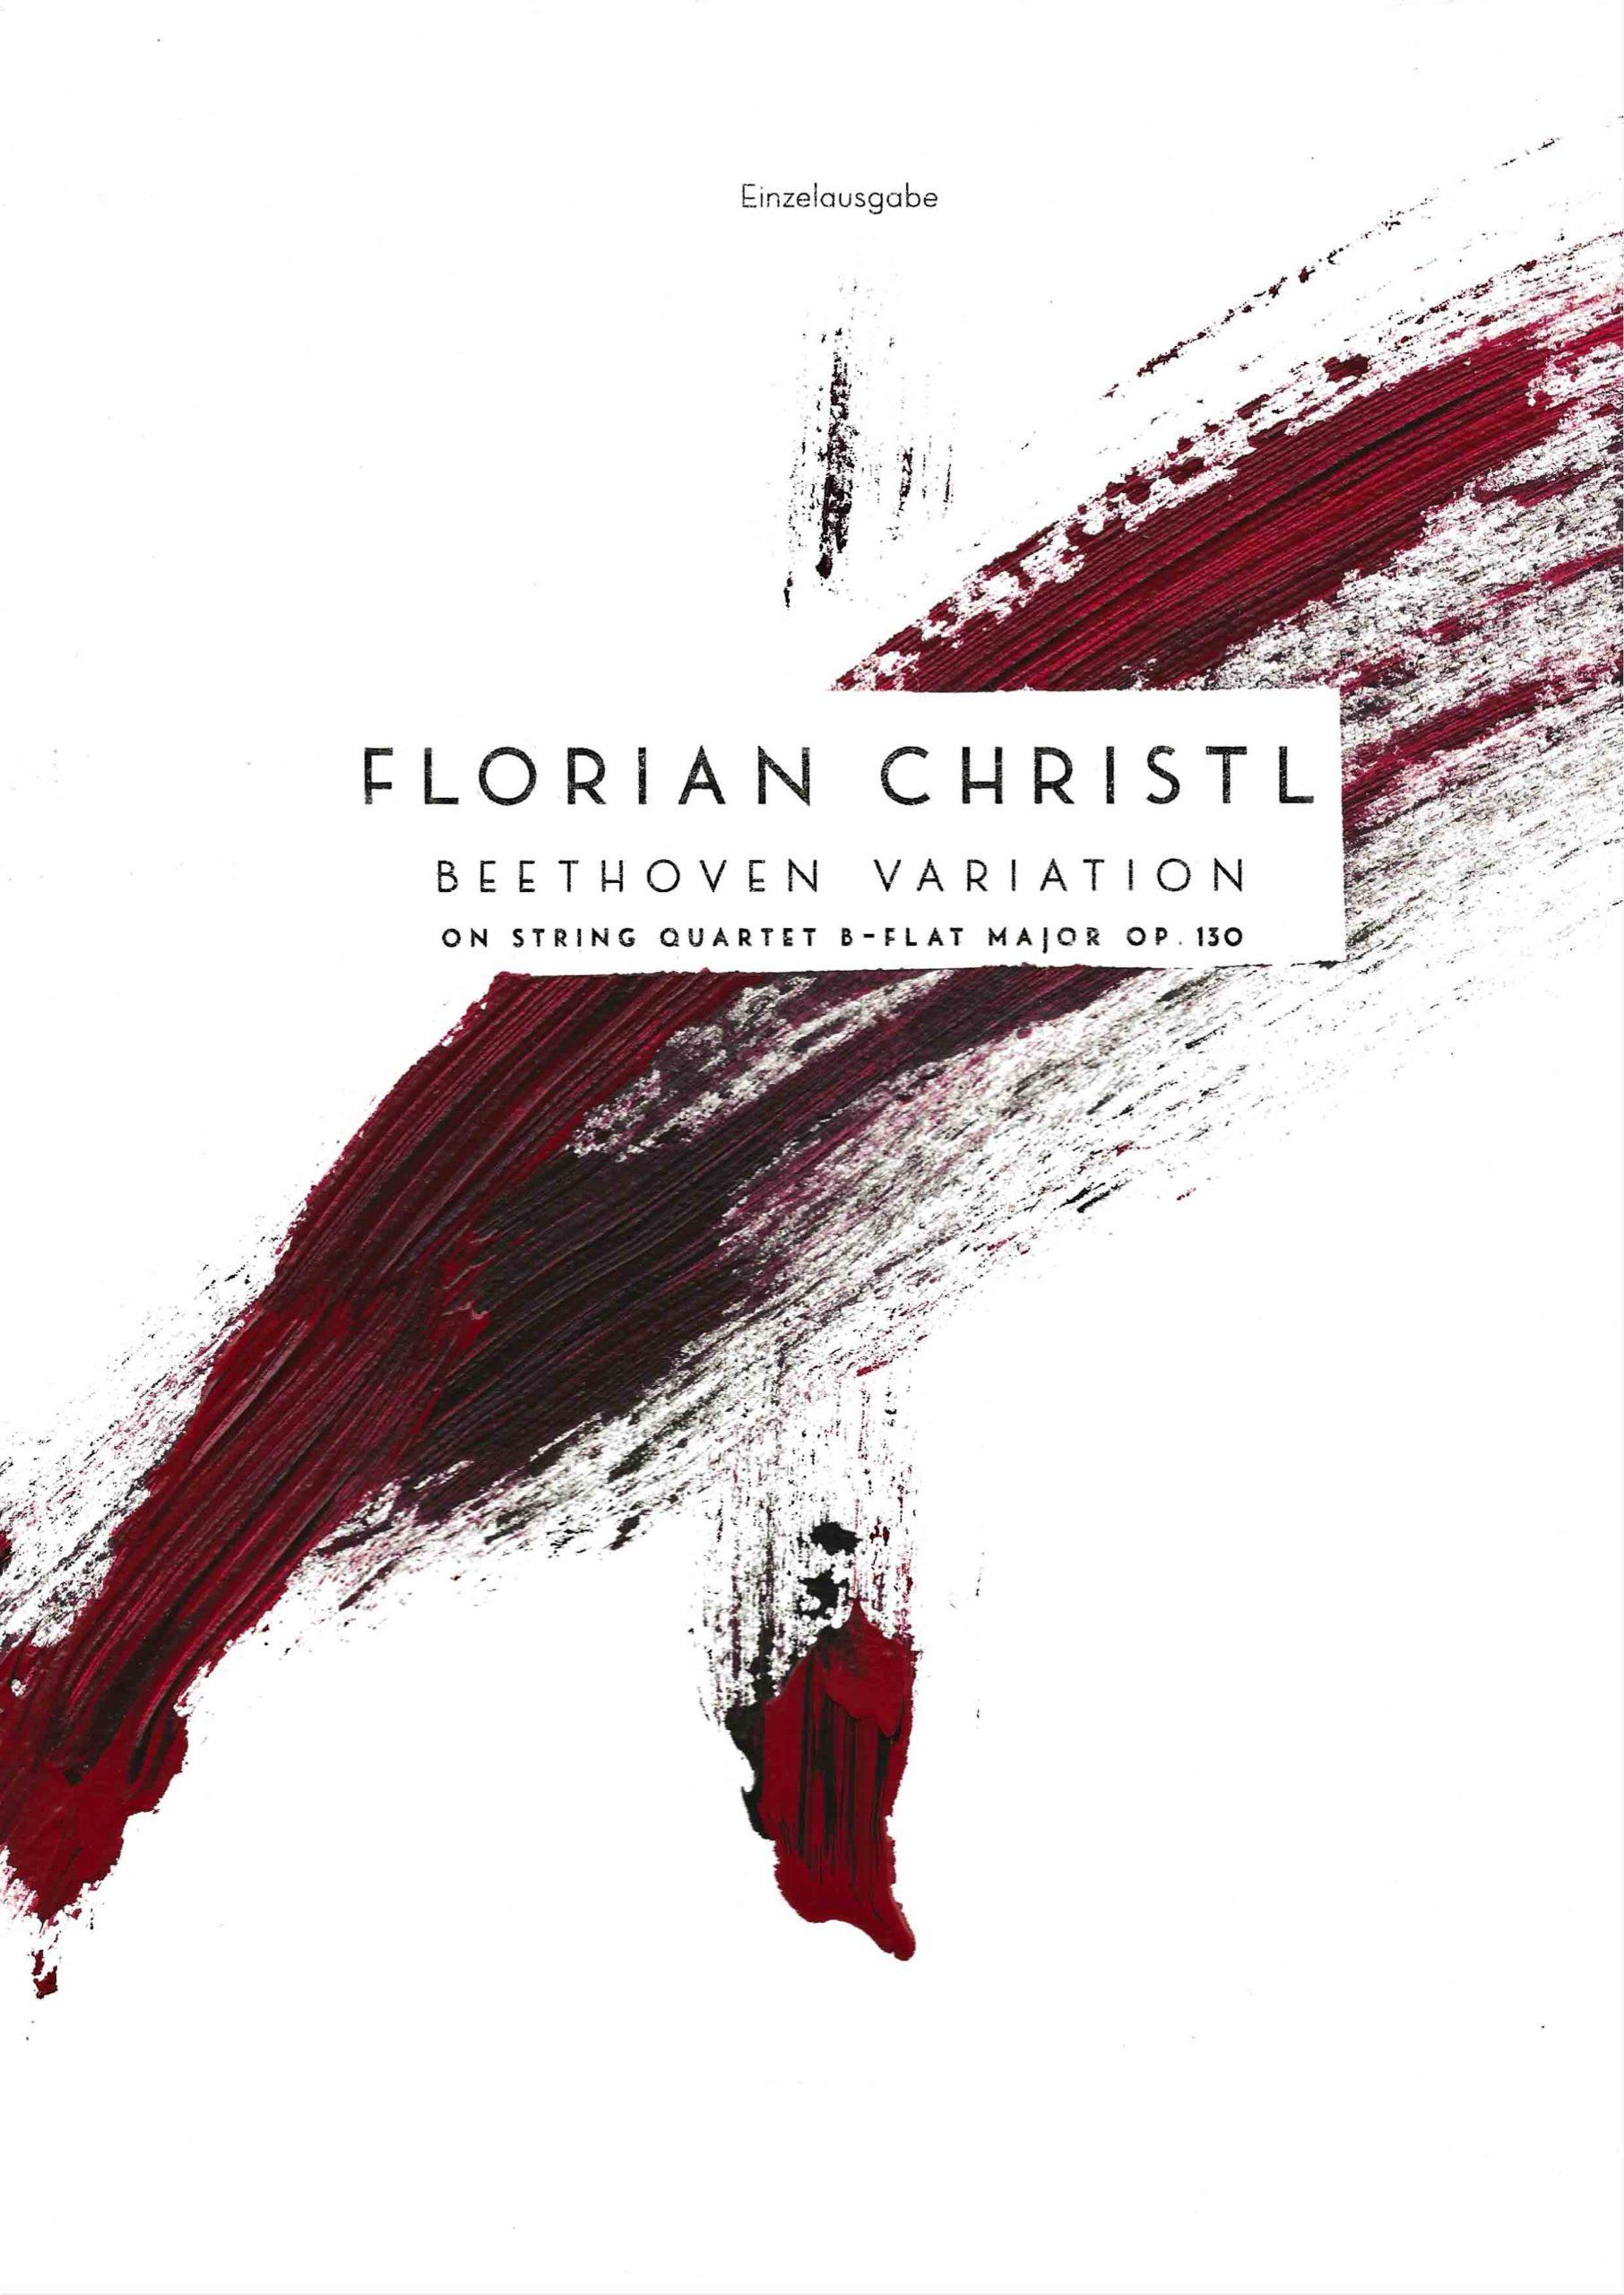 Florian Christl | Music Sheet | Beethoven Variation | 1st edition | 001